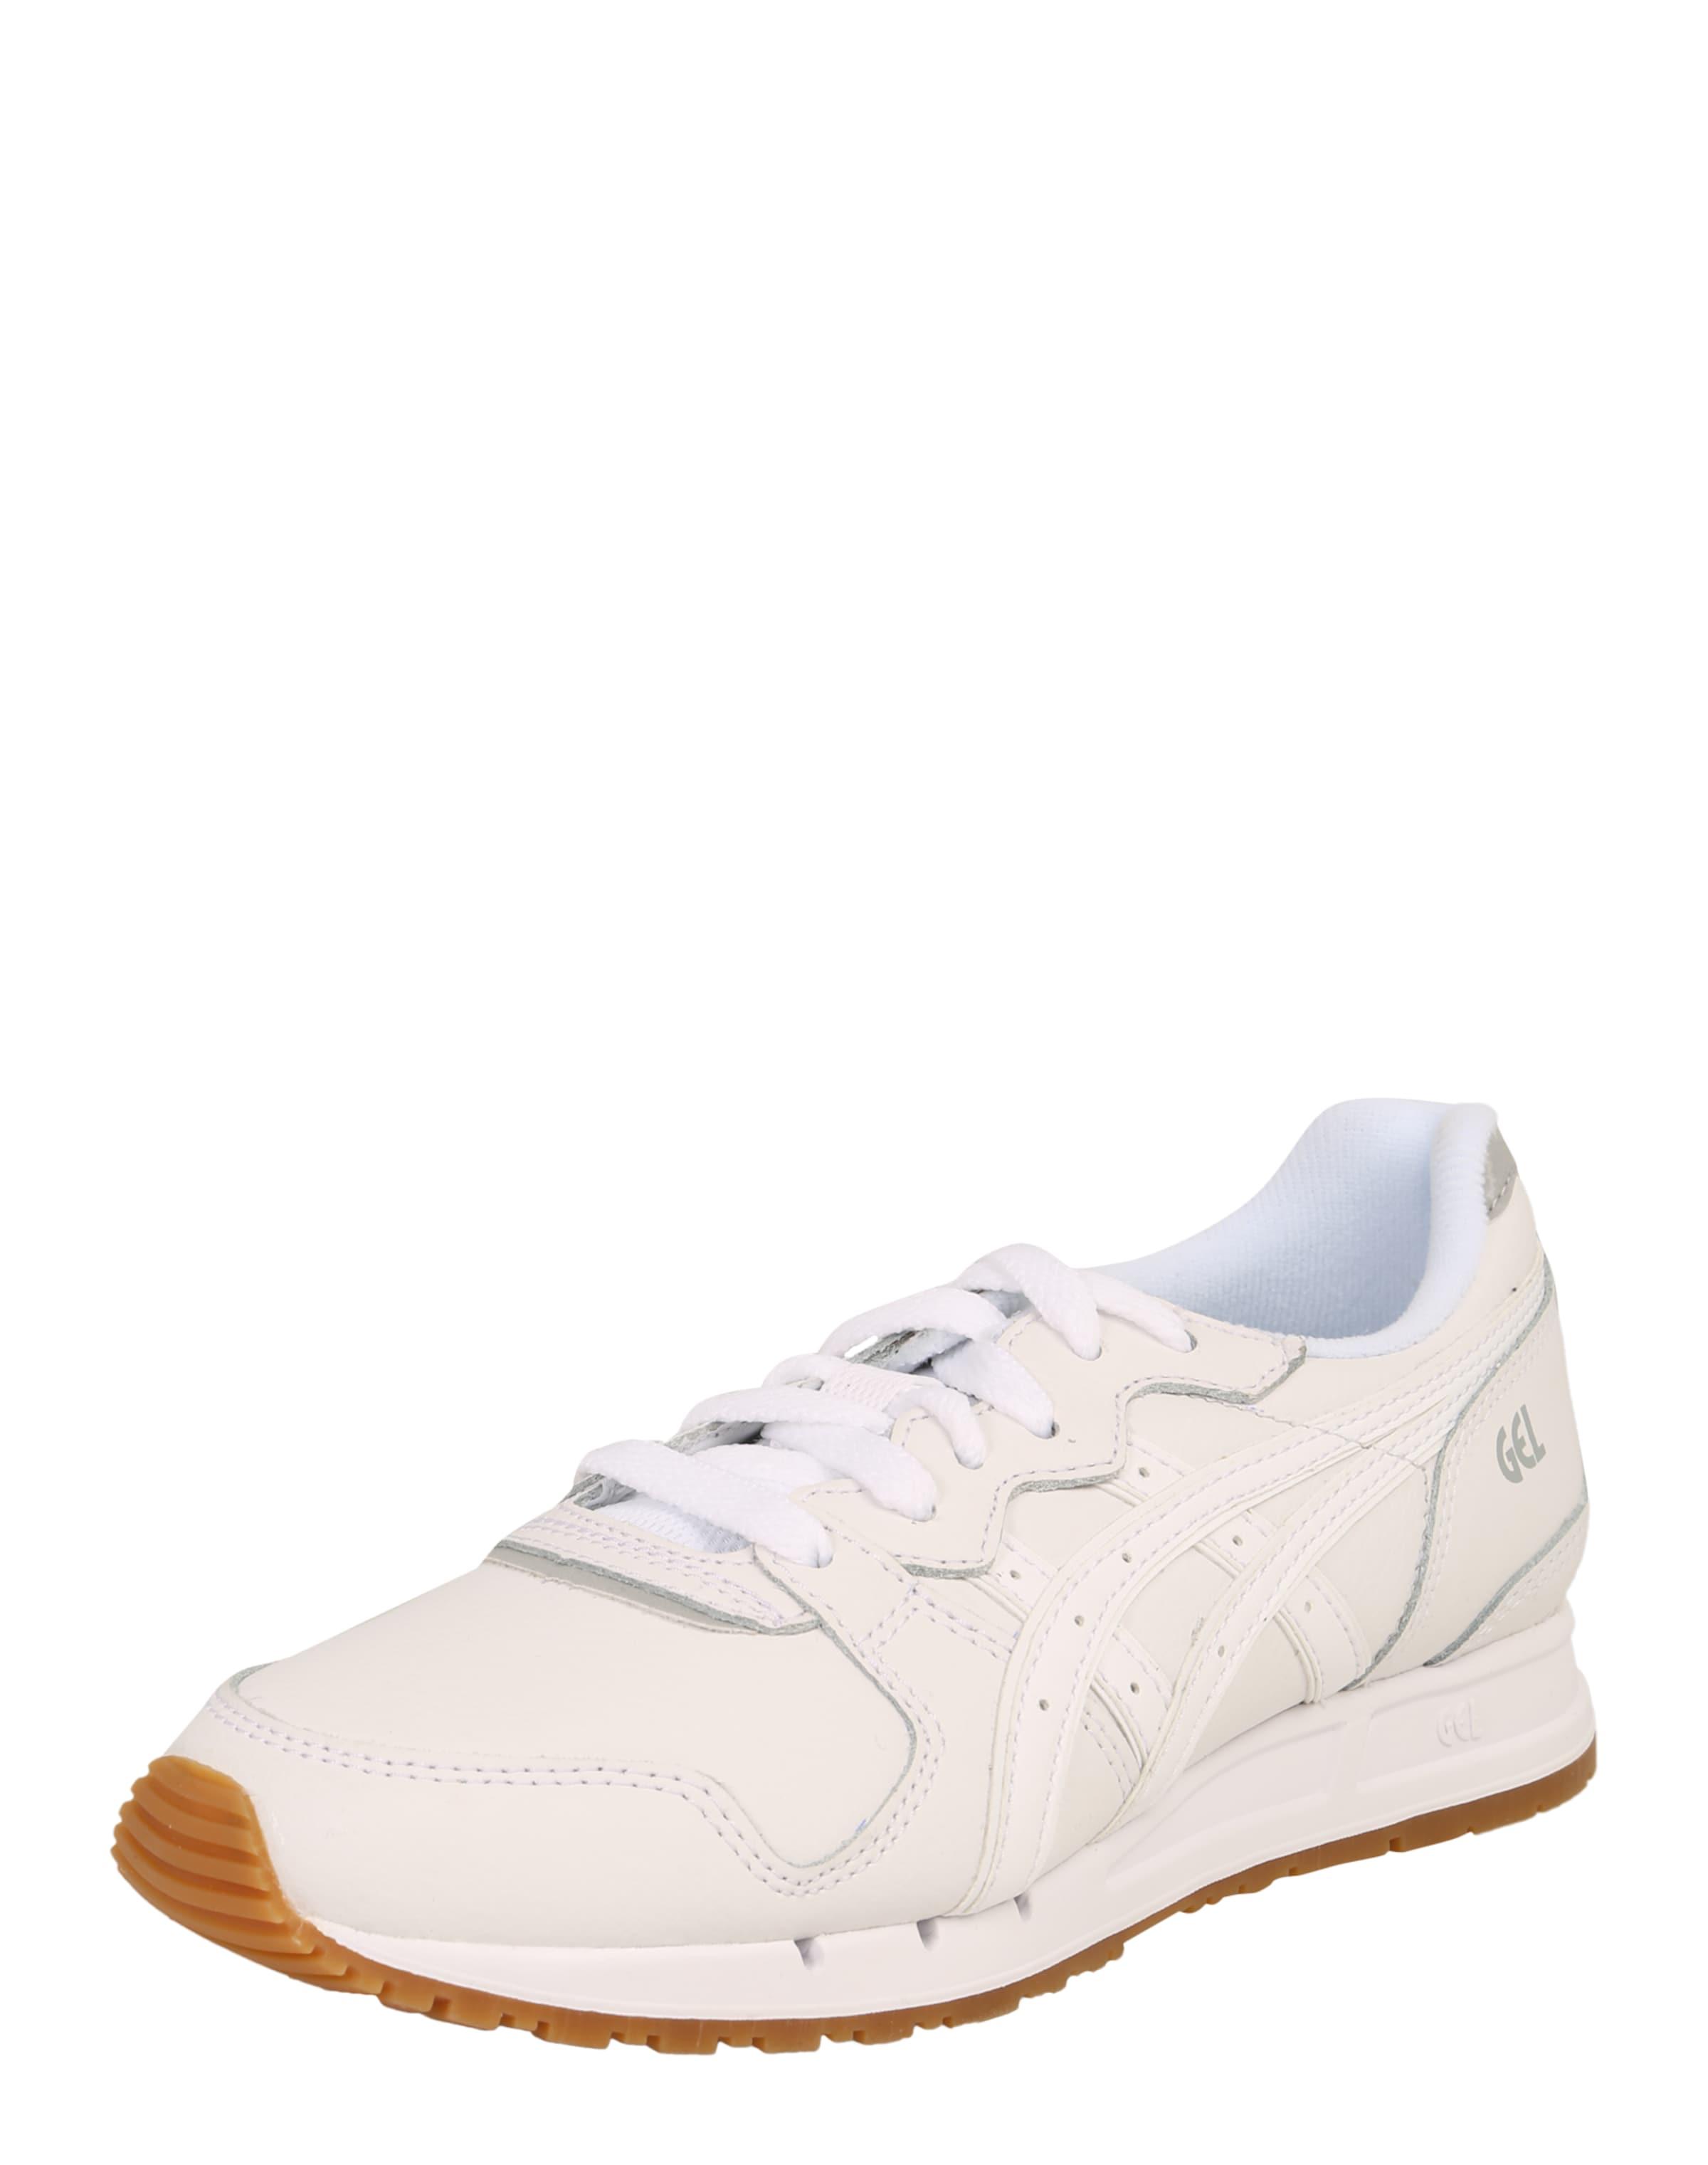 Asics Weiß In 'movimentum' Tiger Sneaker OZnkPwN80X